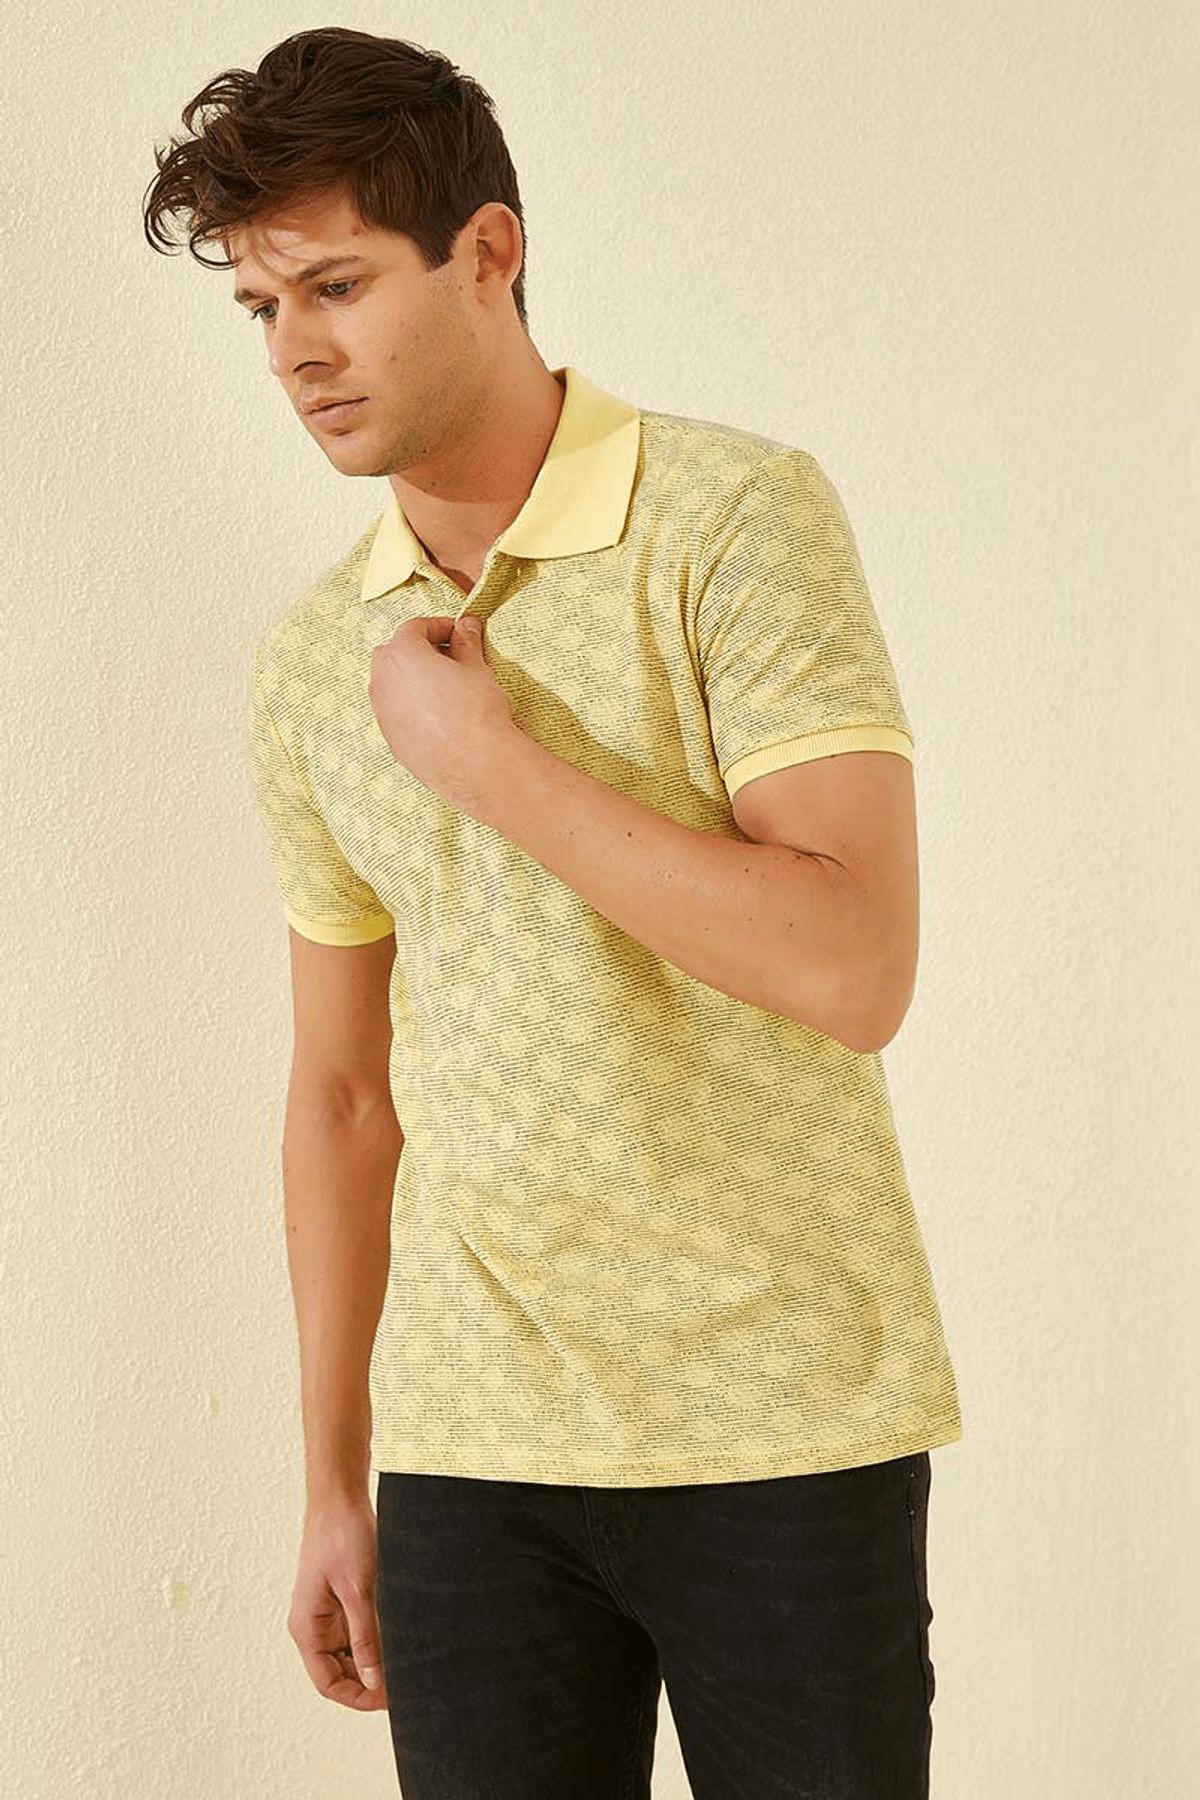 Tommy Life Baskılı Polo Yaka Sarı Erkek T-Shirt T08ER-87796_1 1